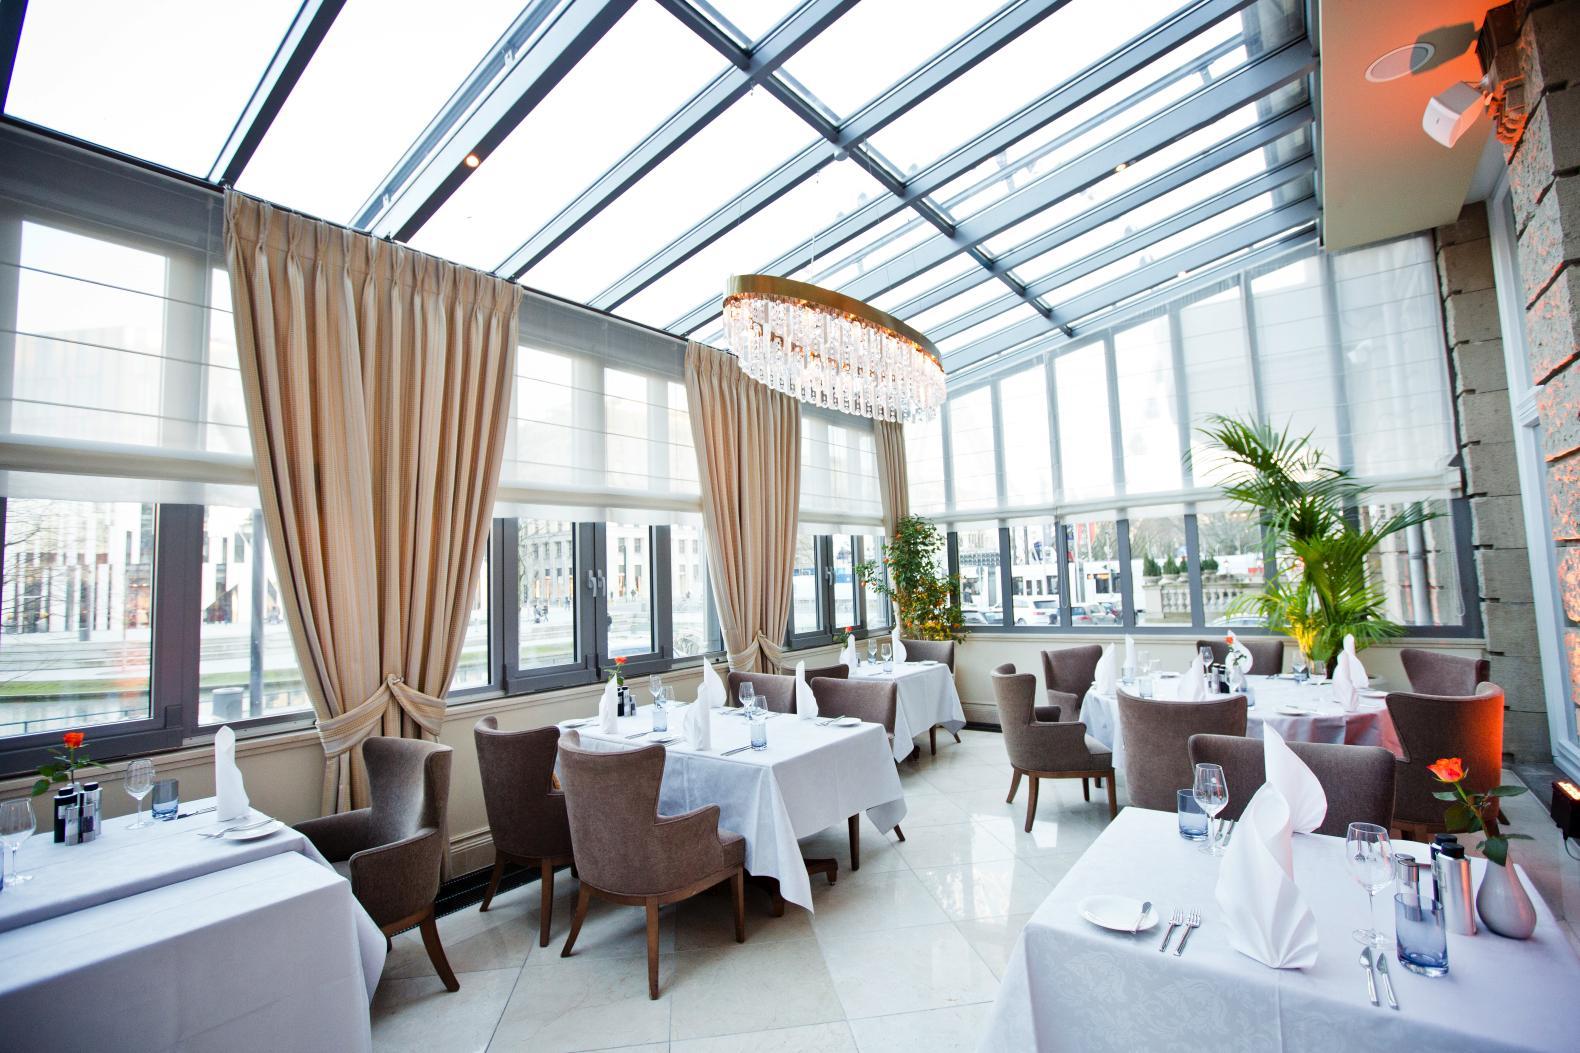 Steigenberger parkhotel d sseldorf ist primo medico for Design hotel taunus